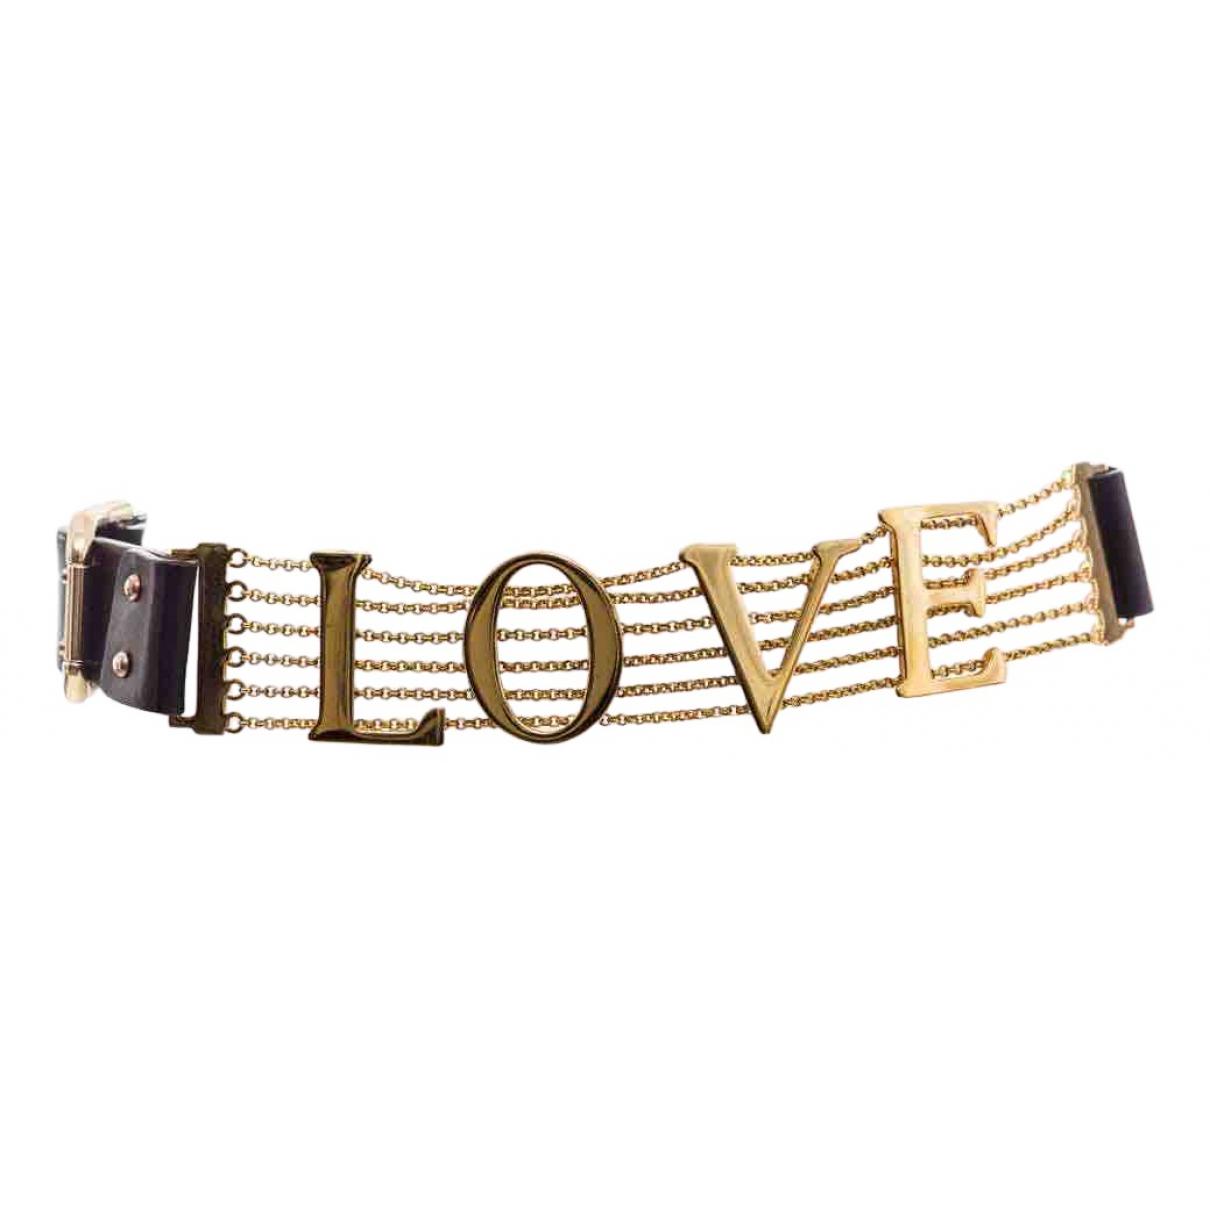 Cinturon de Cuero Dolce & Gabbana